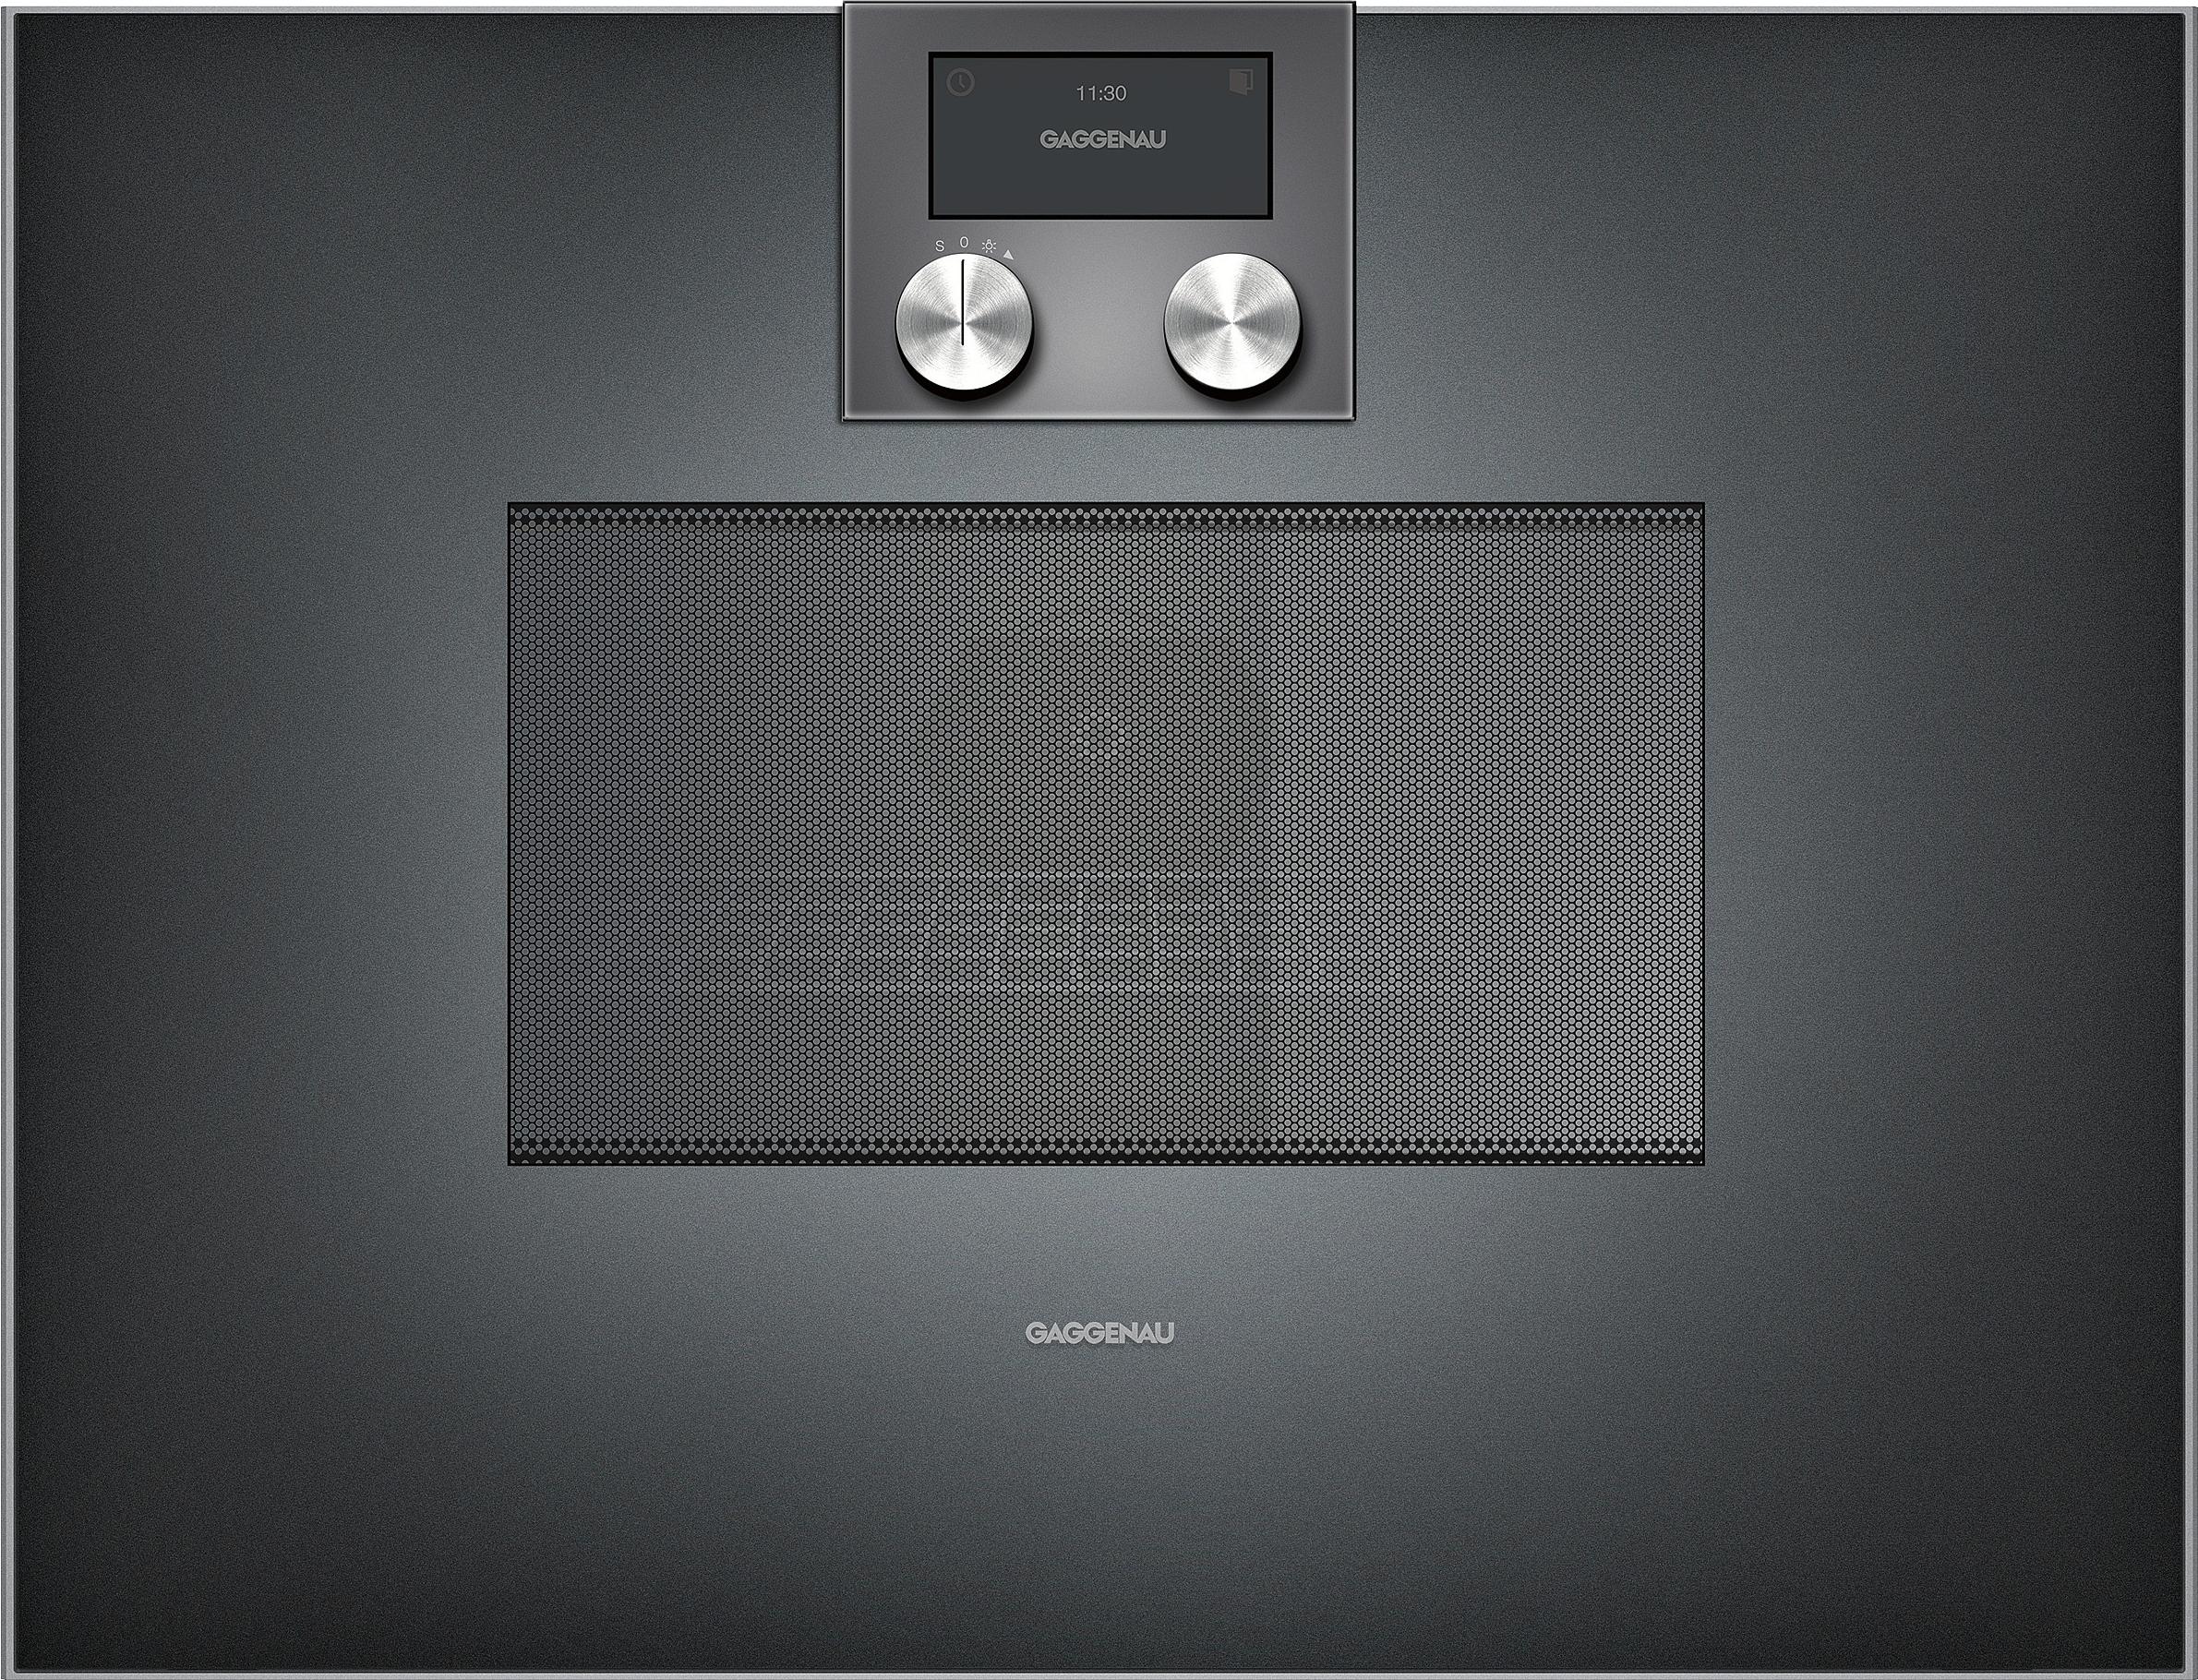 gaggenau bm450100 mikrowellen backofen serie 400. Black Bedroom Furniture Sets. Home Design Ideas